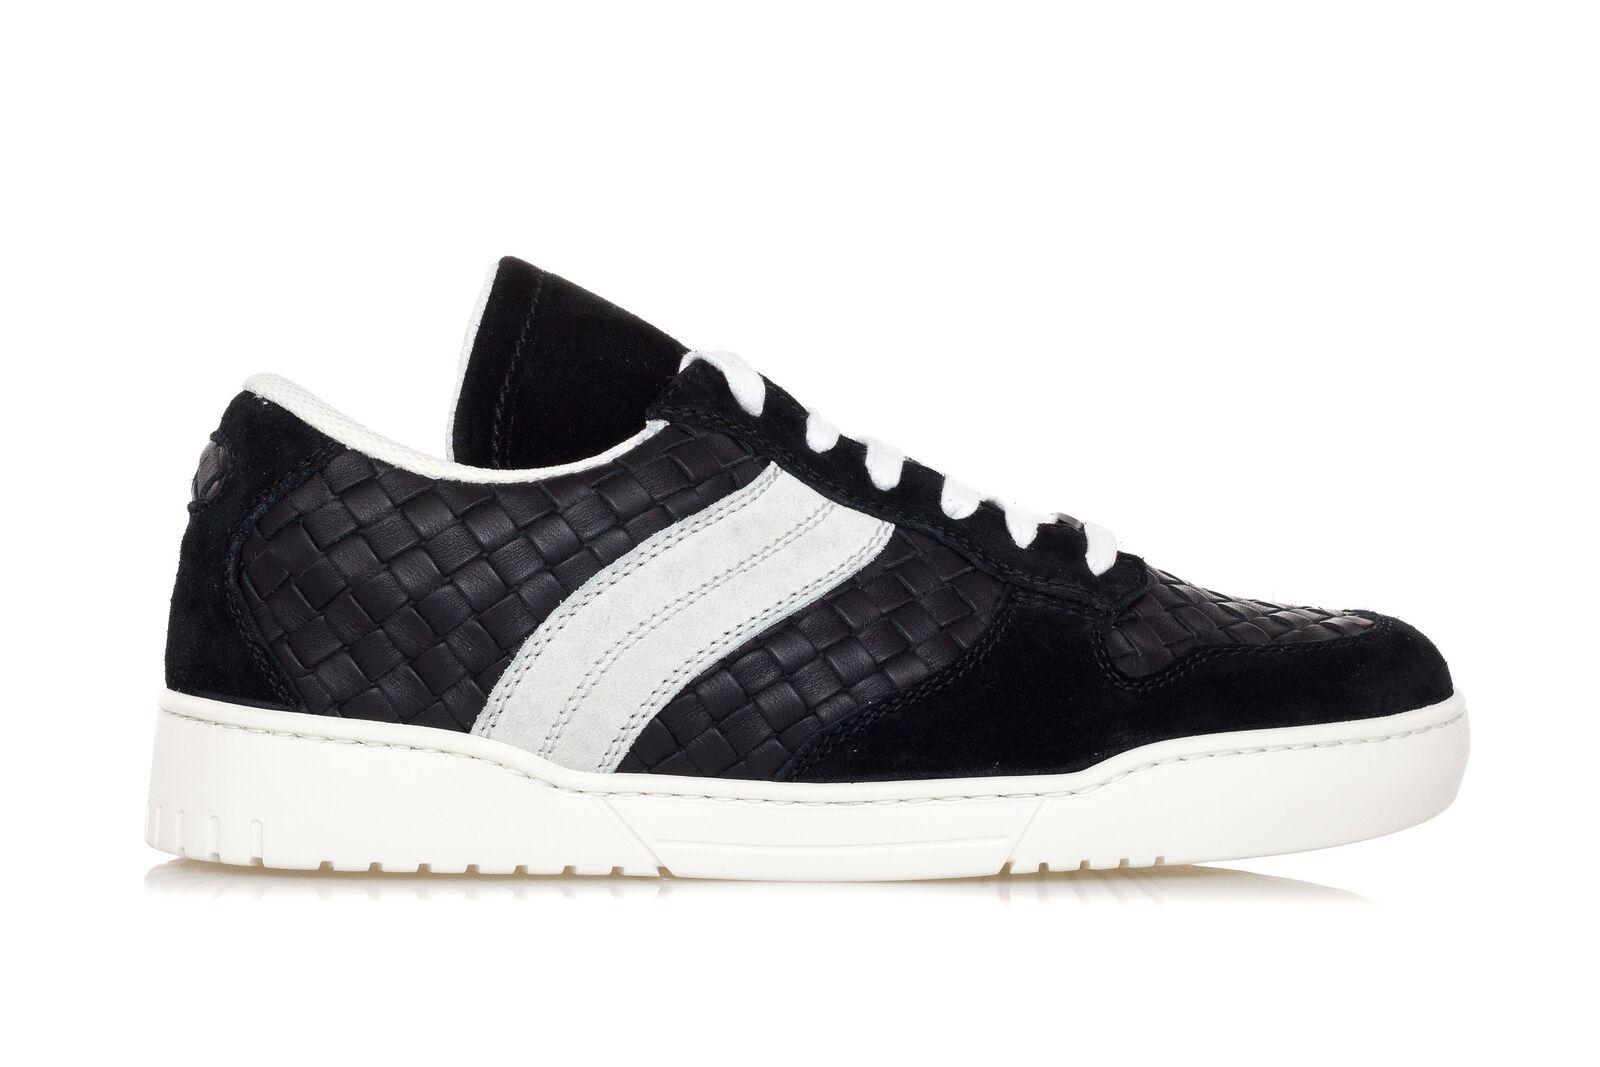 BOTTEGA VENETA Mens Shoes Sneakers HEEZE Black INTRECCIATO Leather Suede Trainer